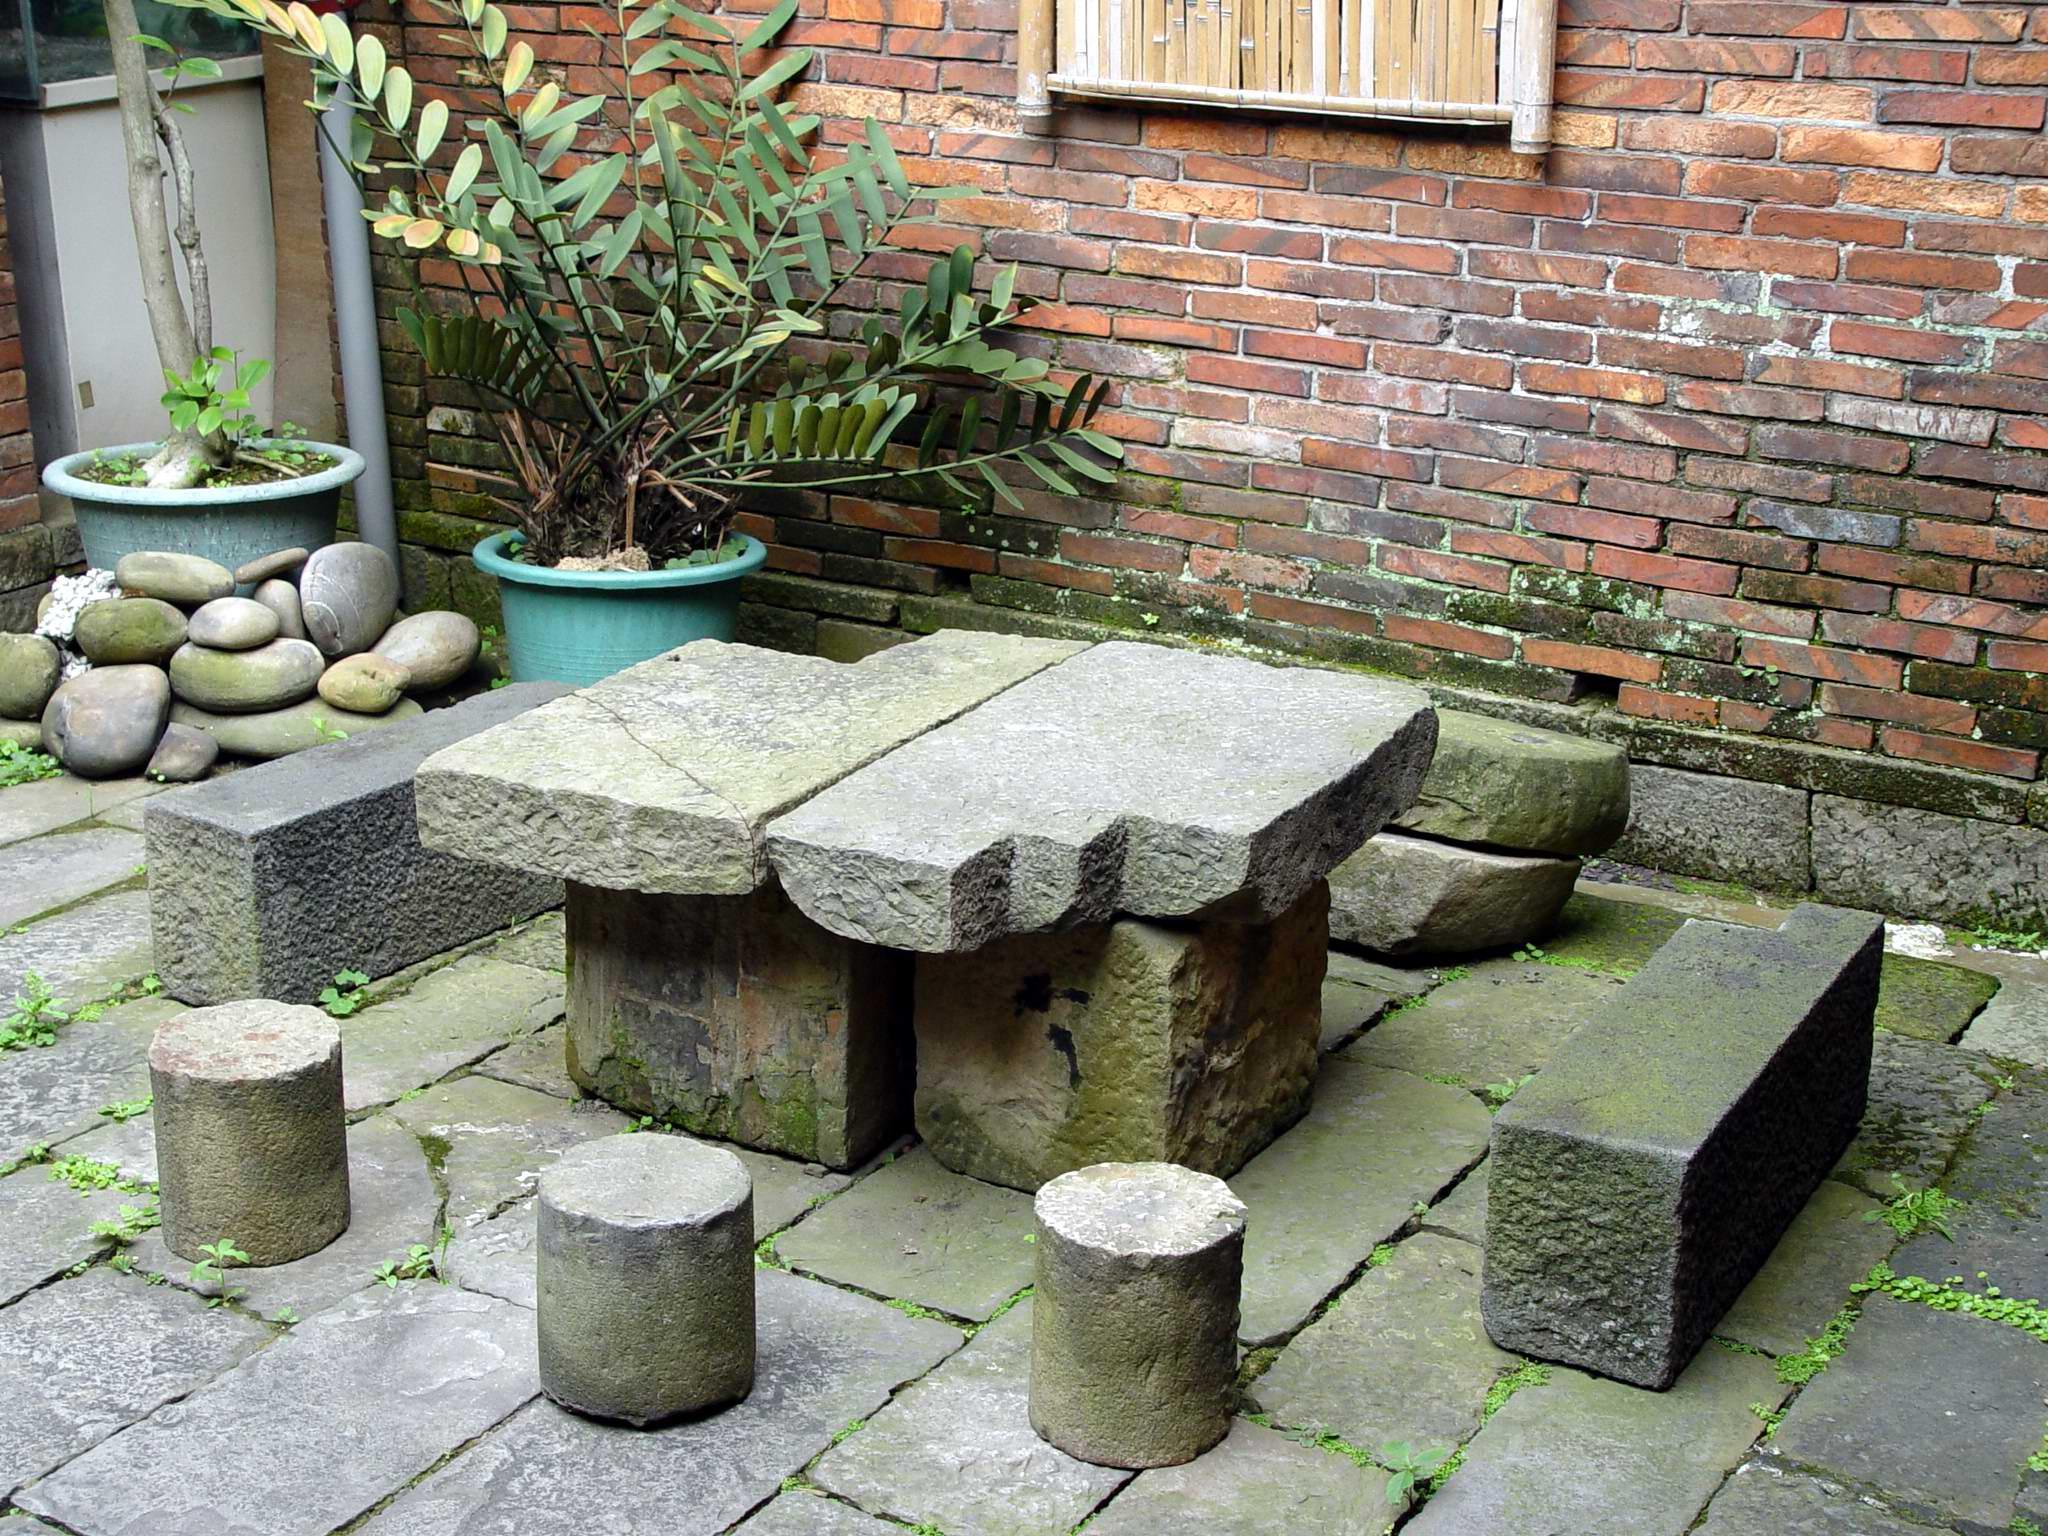 06 Stone table and chairsJPG : 0620Stone20table20and20chairs from people.cs.nctu.edu.tw size 2048 x 1536 jpeg 529kB